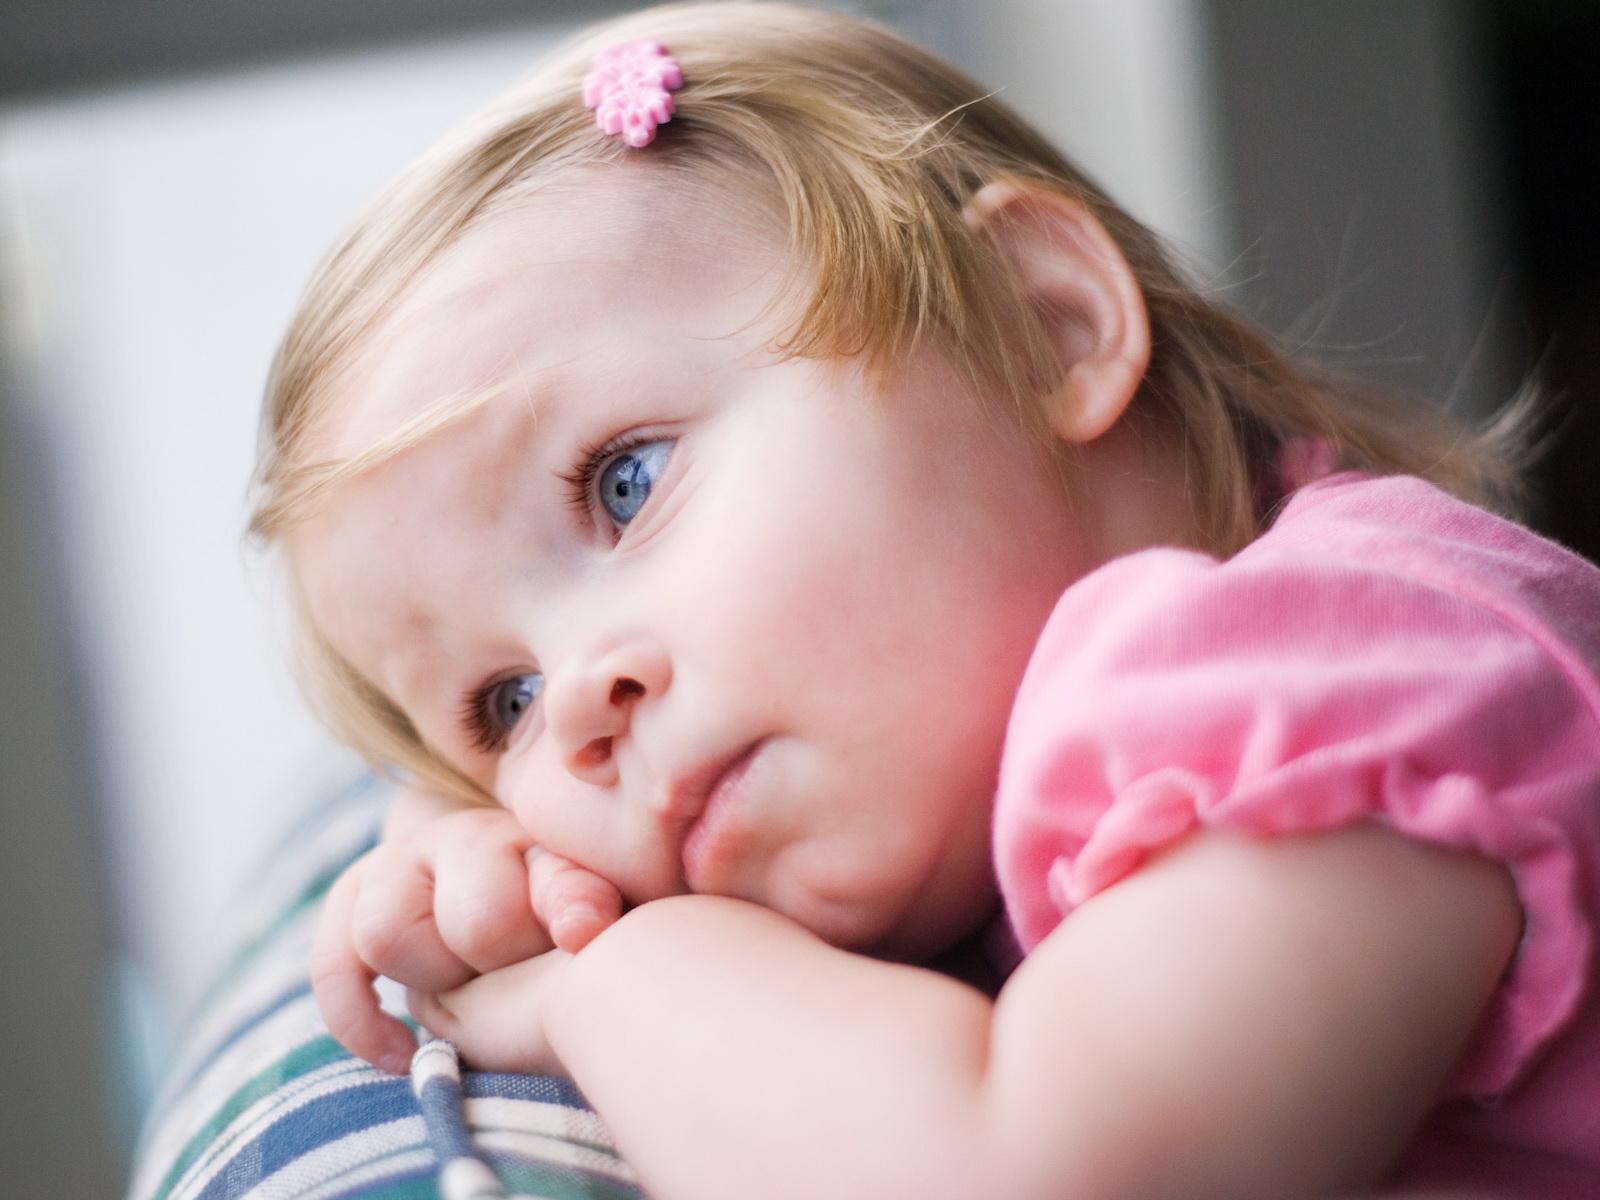 hd bebek resimleri rooteto+%252848%2529 30 En Güzel HD Kalite Bebek Resimleri moda_trend